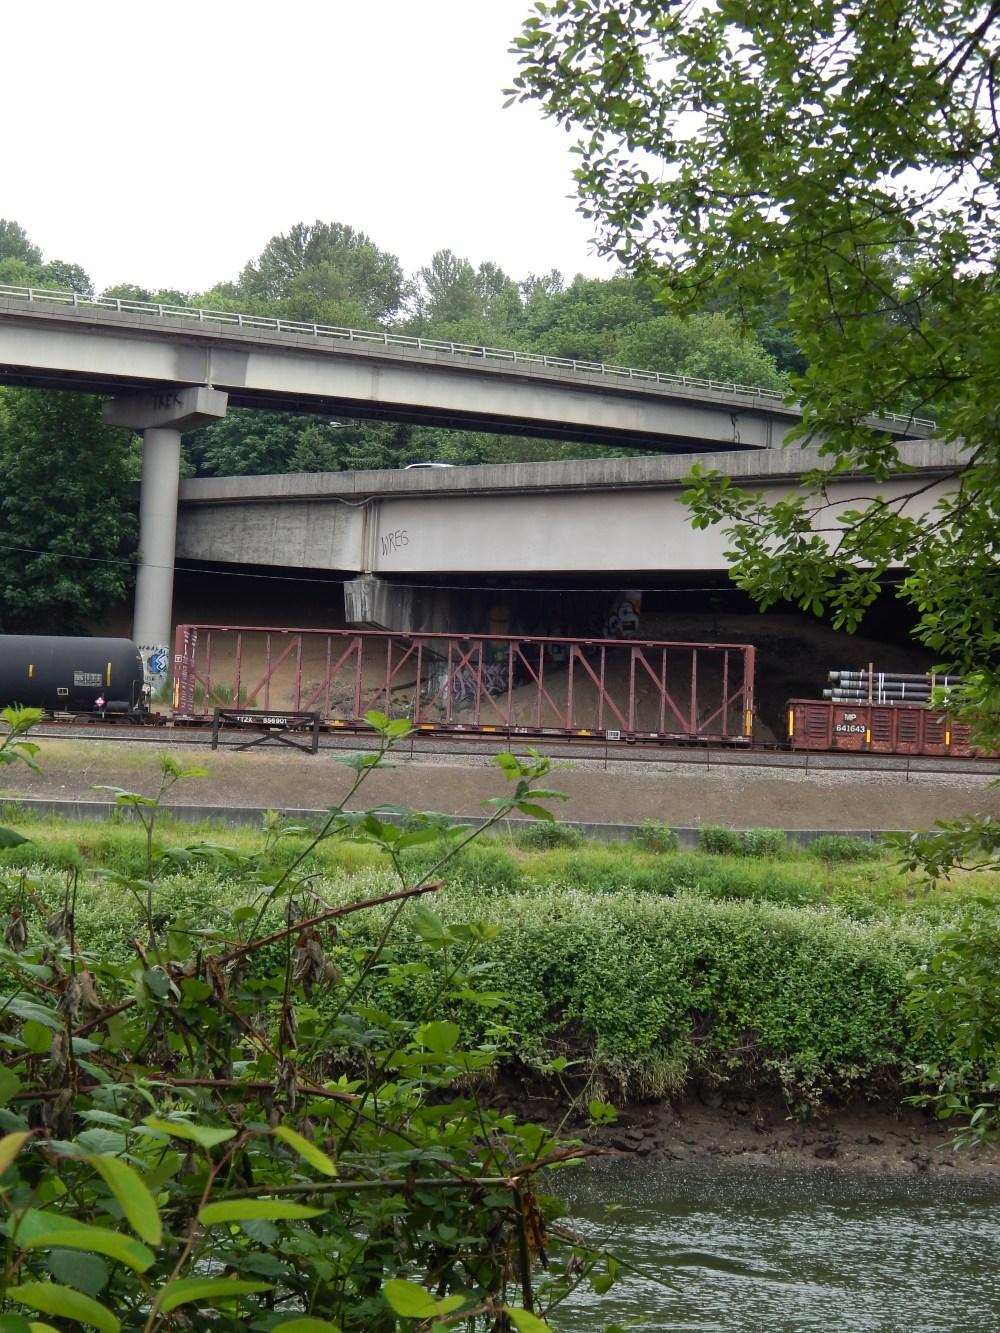 Codiga Bridge from Allentown over Rails and I-5